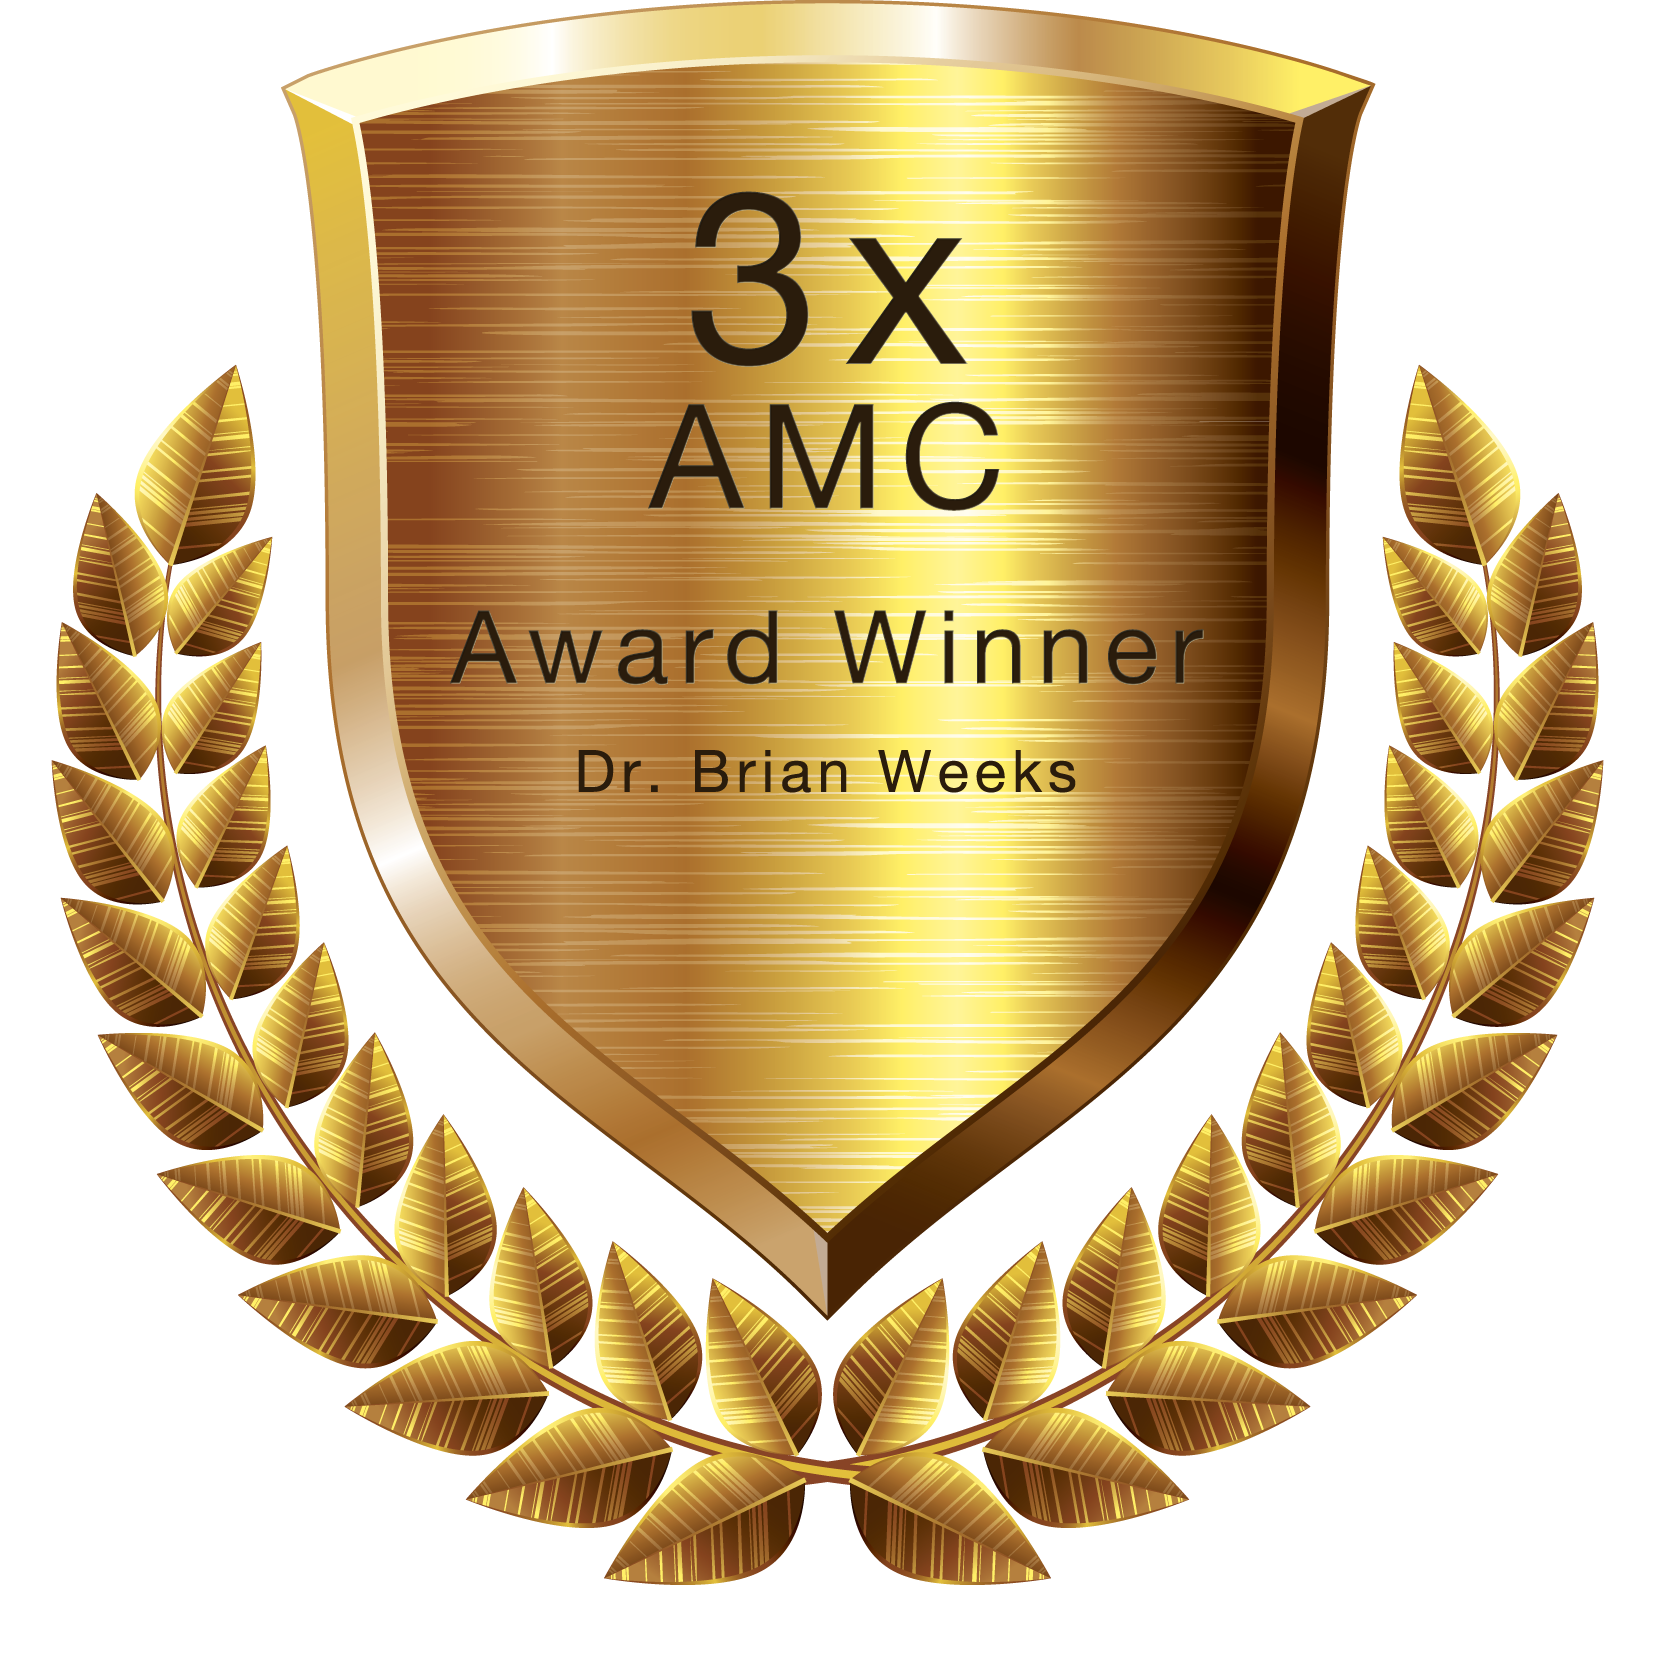 AMC-Longmont-Chiropractor-award-winner.jpg